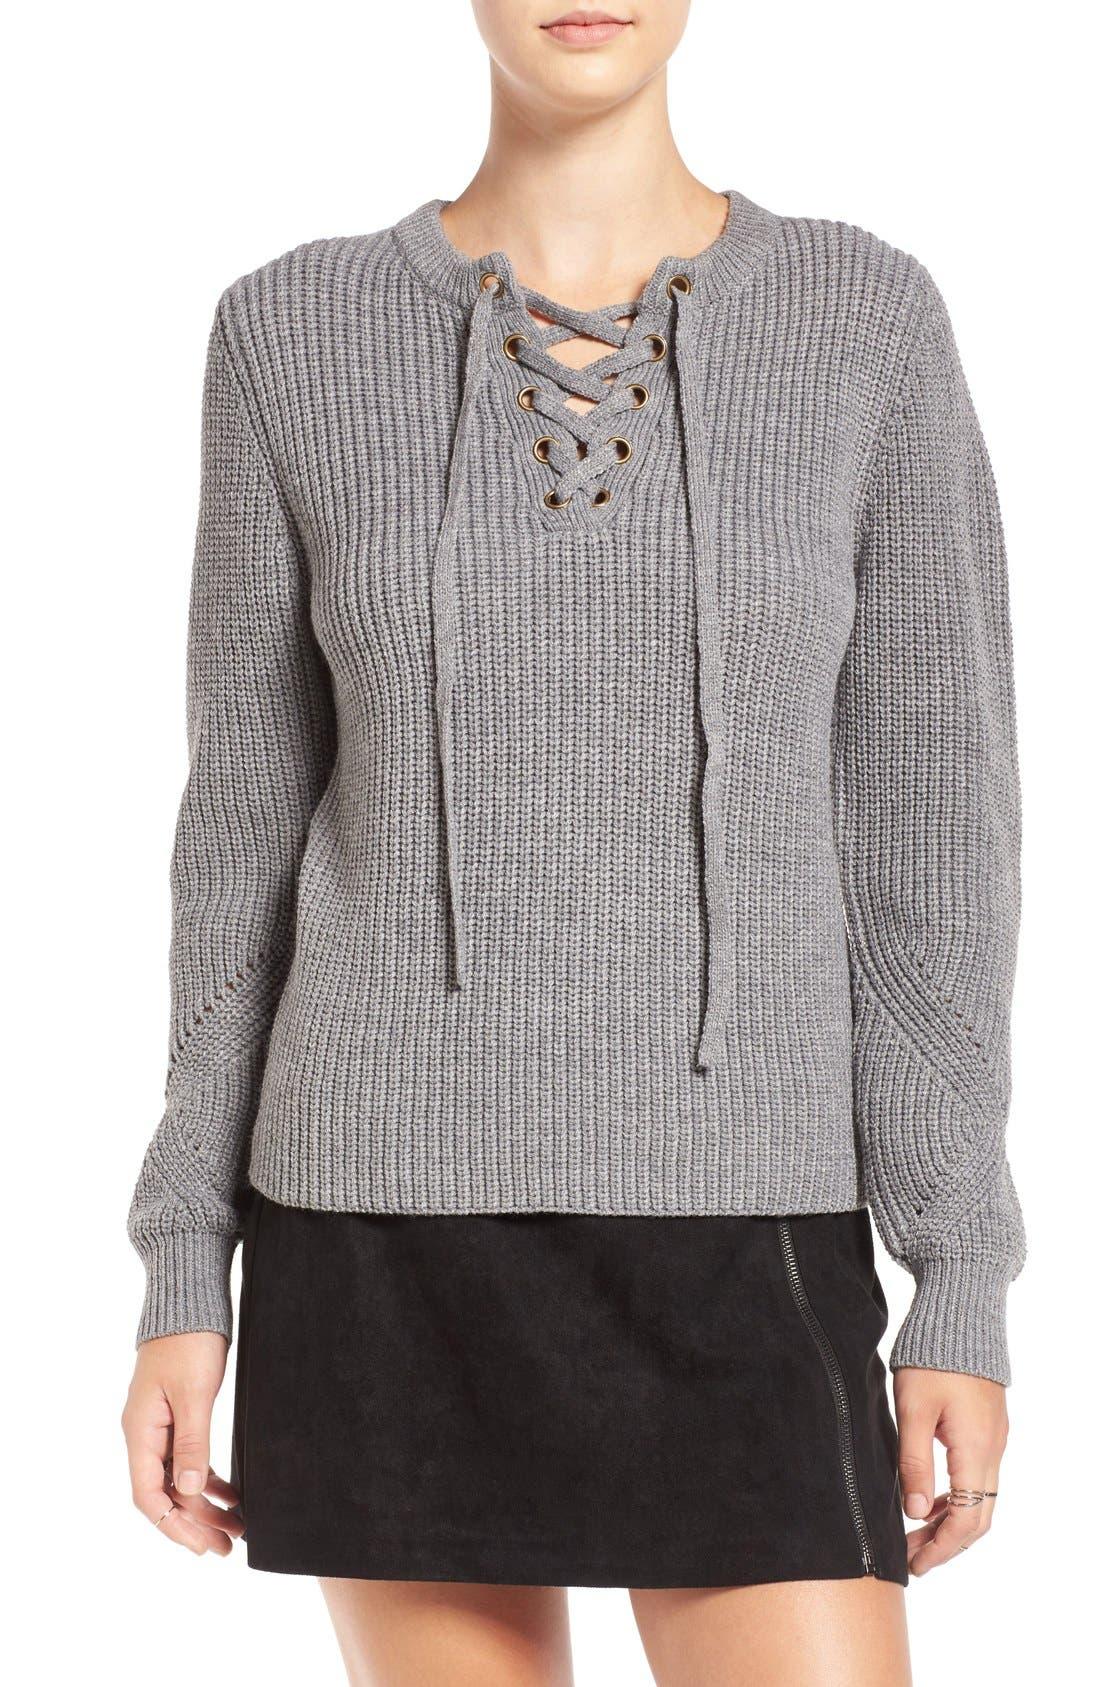 Main Image - Elodie Rib Knit Lace-Up Sweater